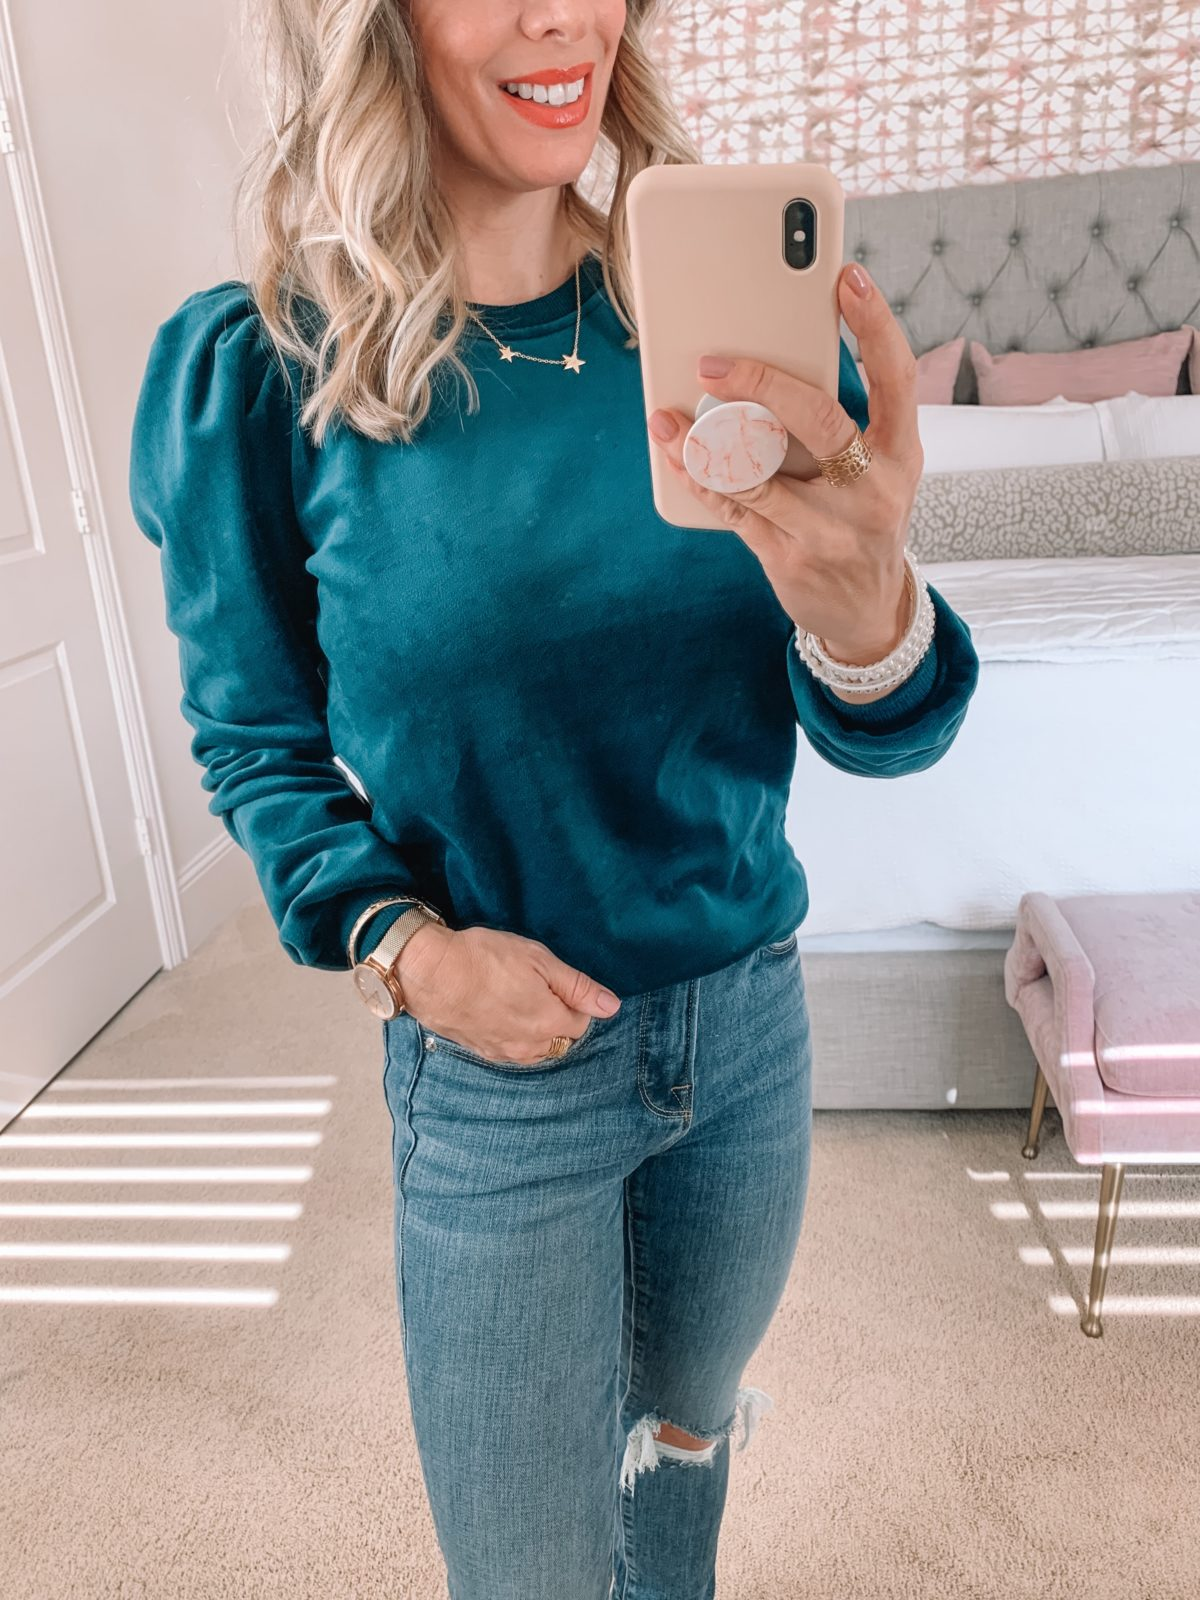 Dressing Room Finds Nordstrom, Velvet top, Good American Jeans, Booties